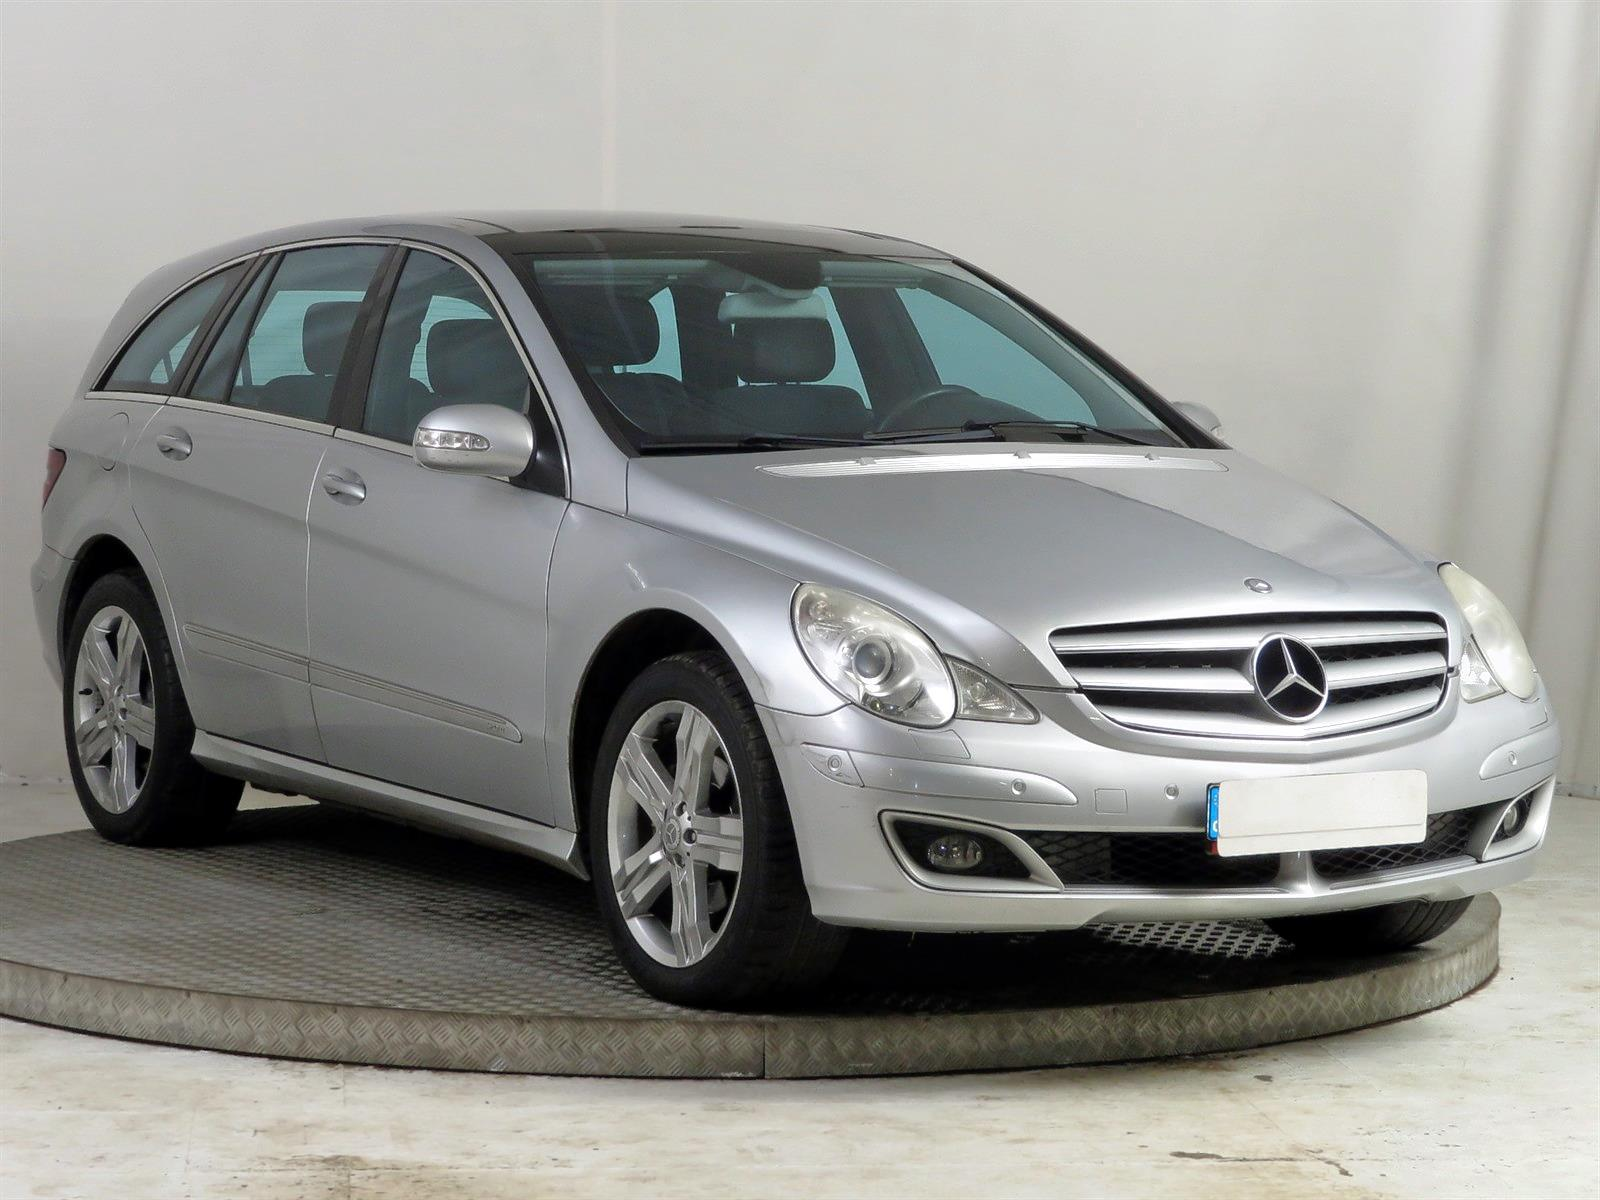 Mercedes-Benz Třídy R R 320 CDI 4MATIC 165kW MPV nafta